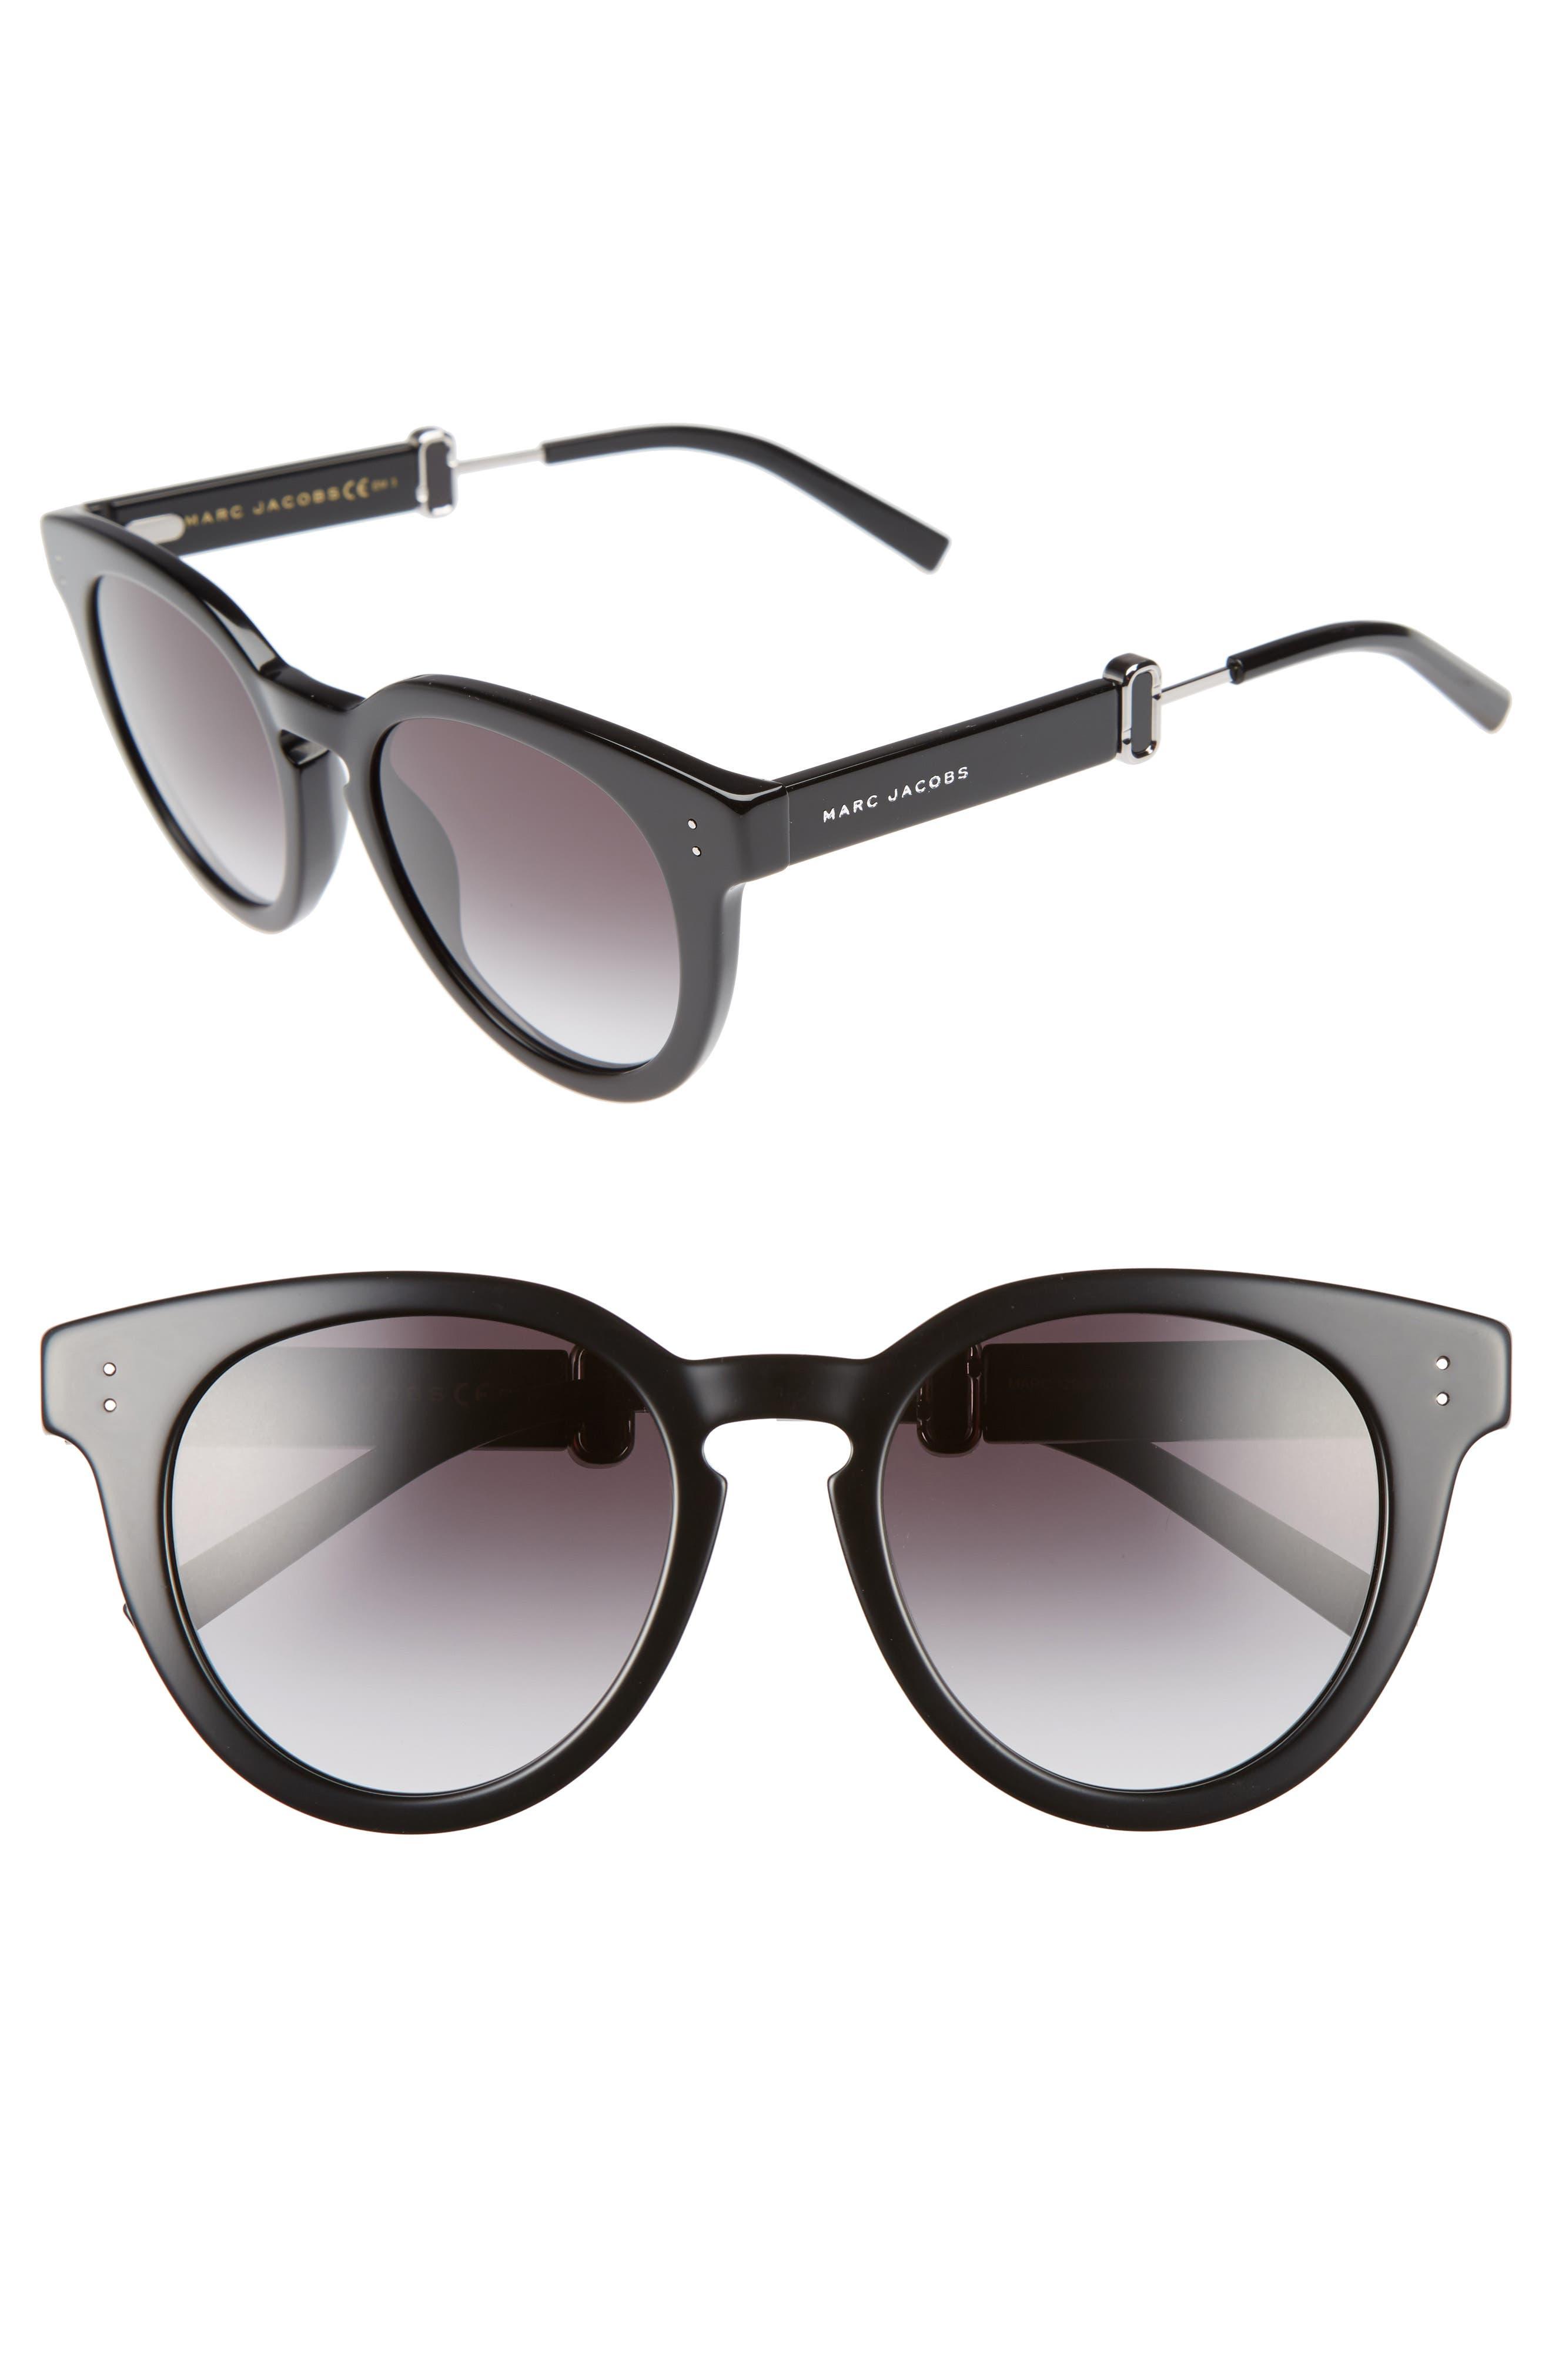 50mm Round Sunglasses,                             Main thumbnail 1, color,                             001